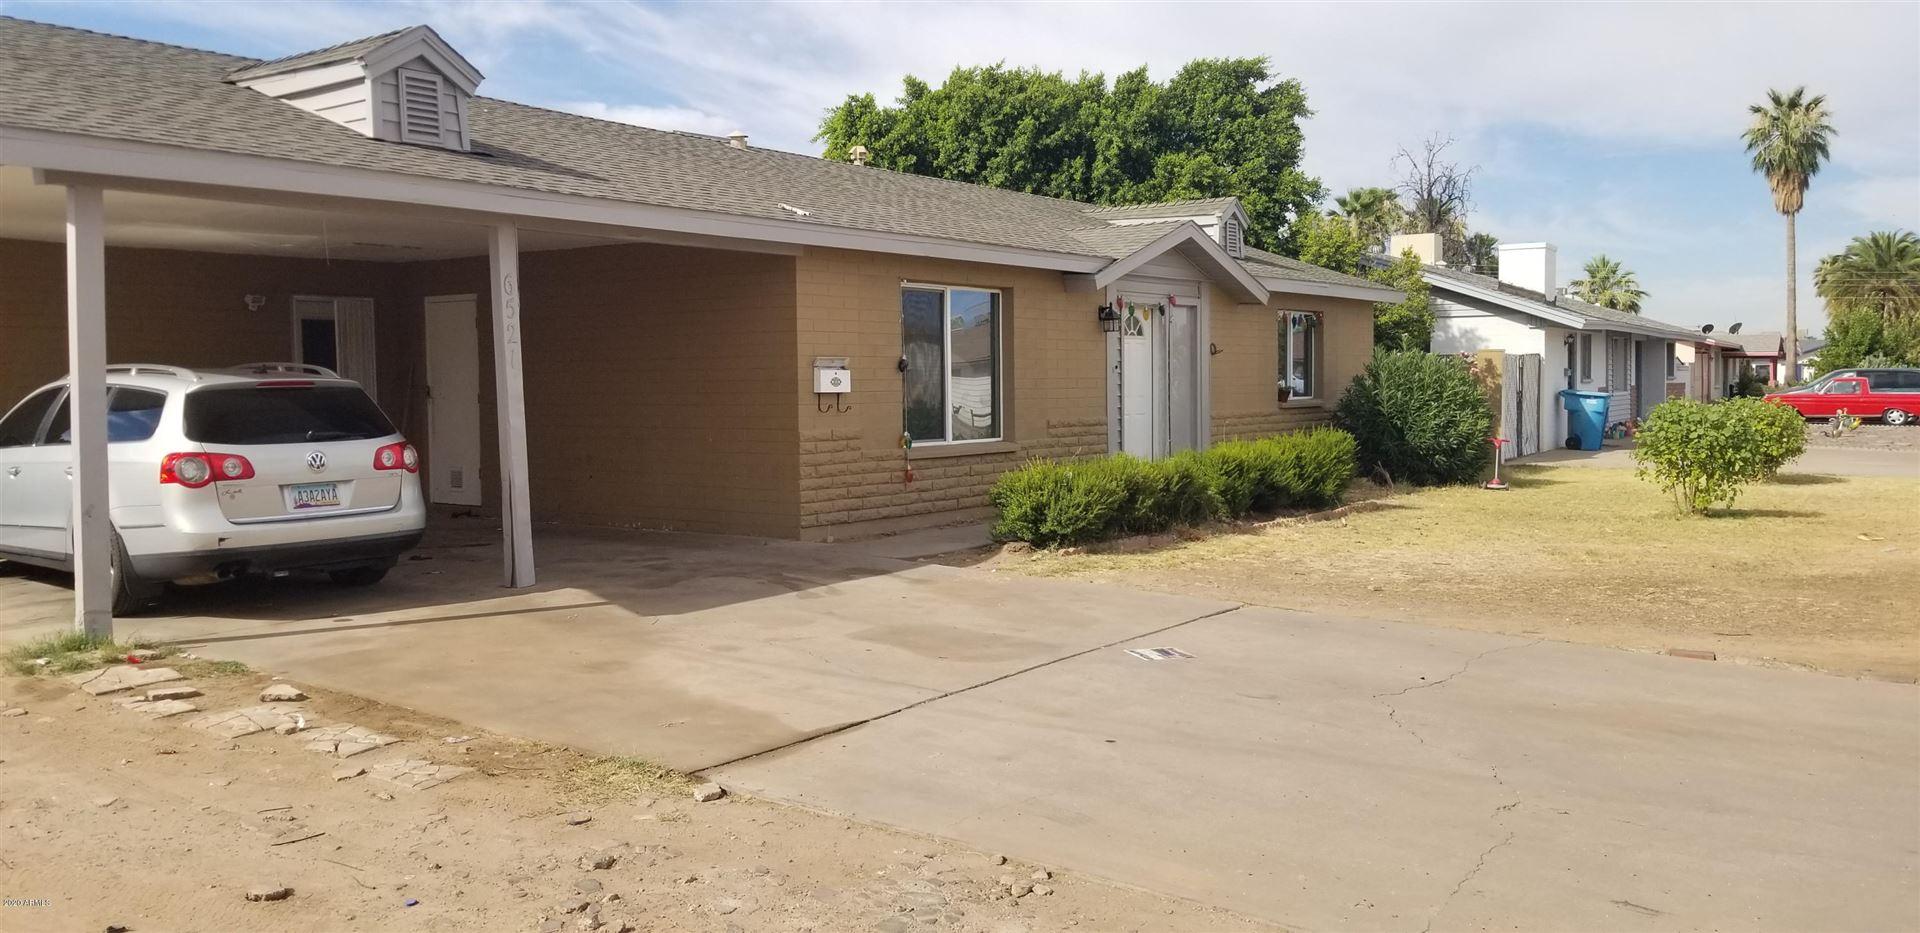 Property Image Of 6521 W Turney Avenue In Phoenix, Az